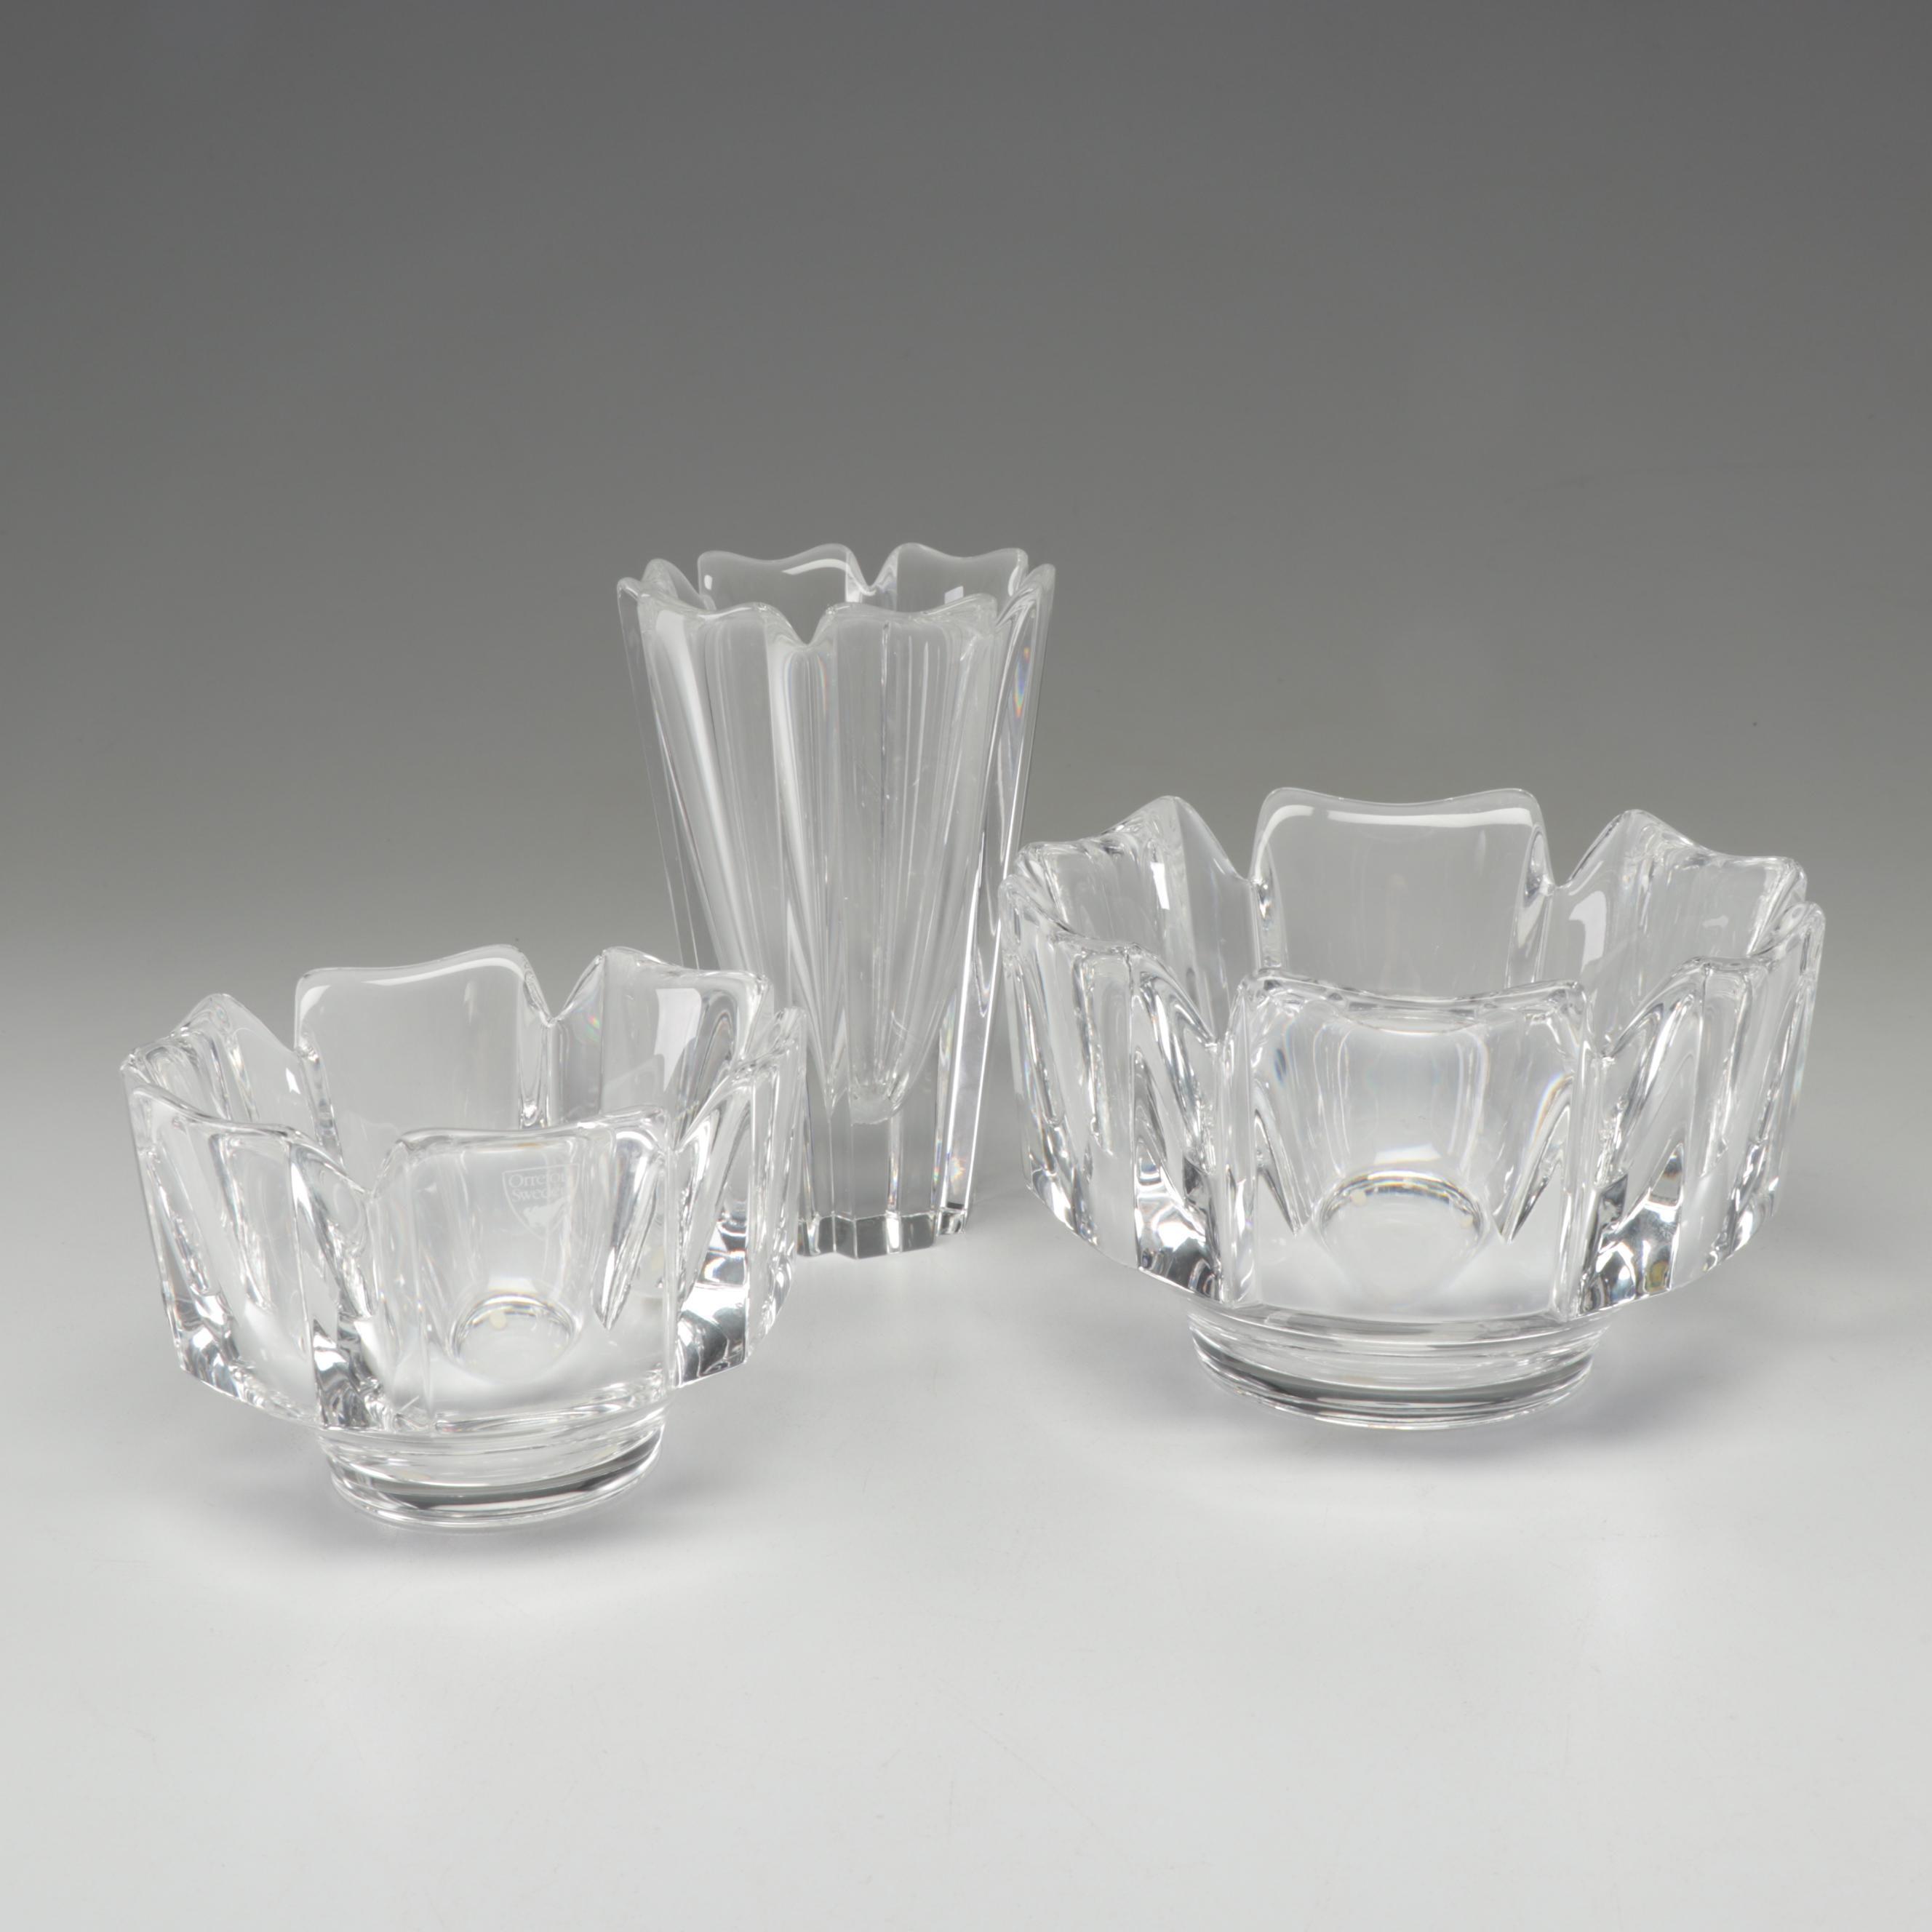 Orrefors Crystal Vase and Bowls by Lars Hellsten